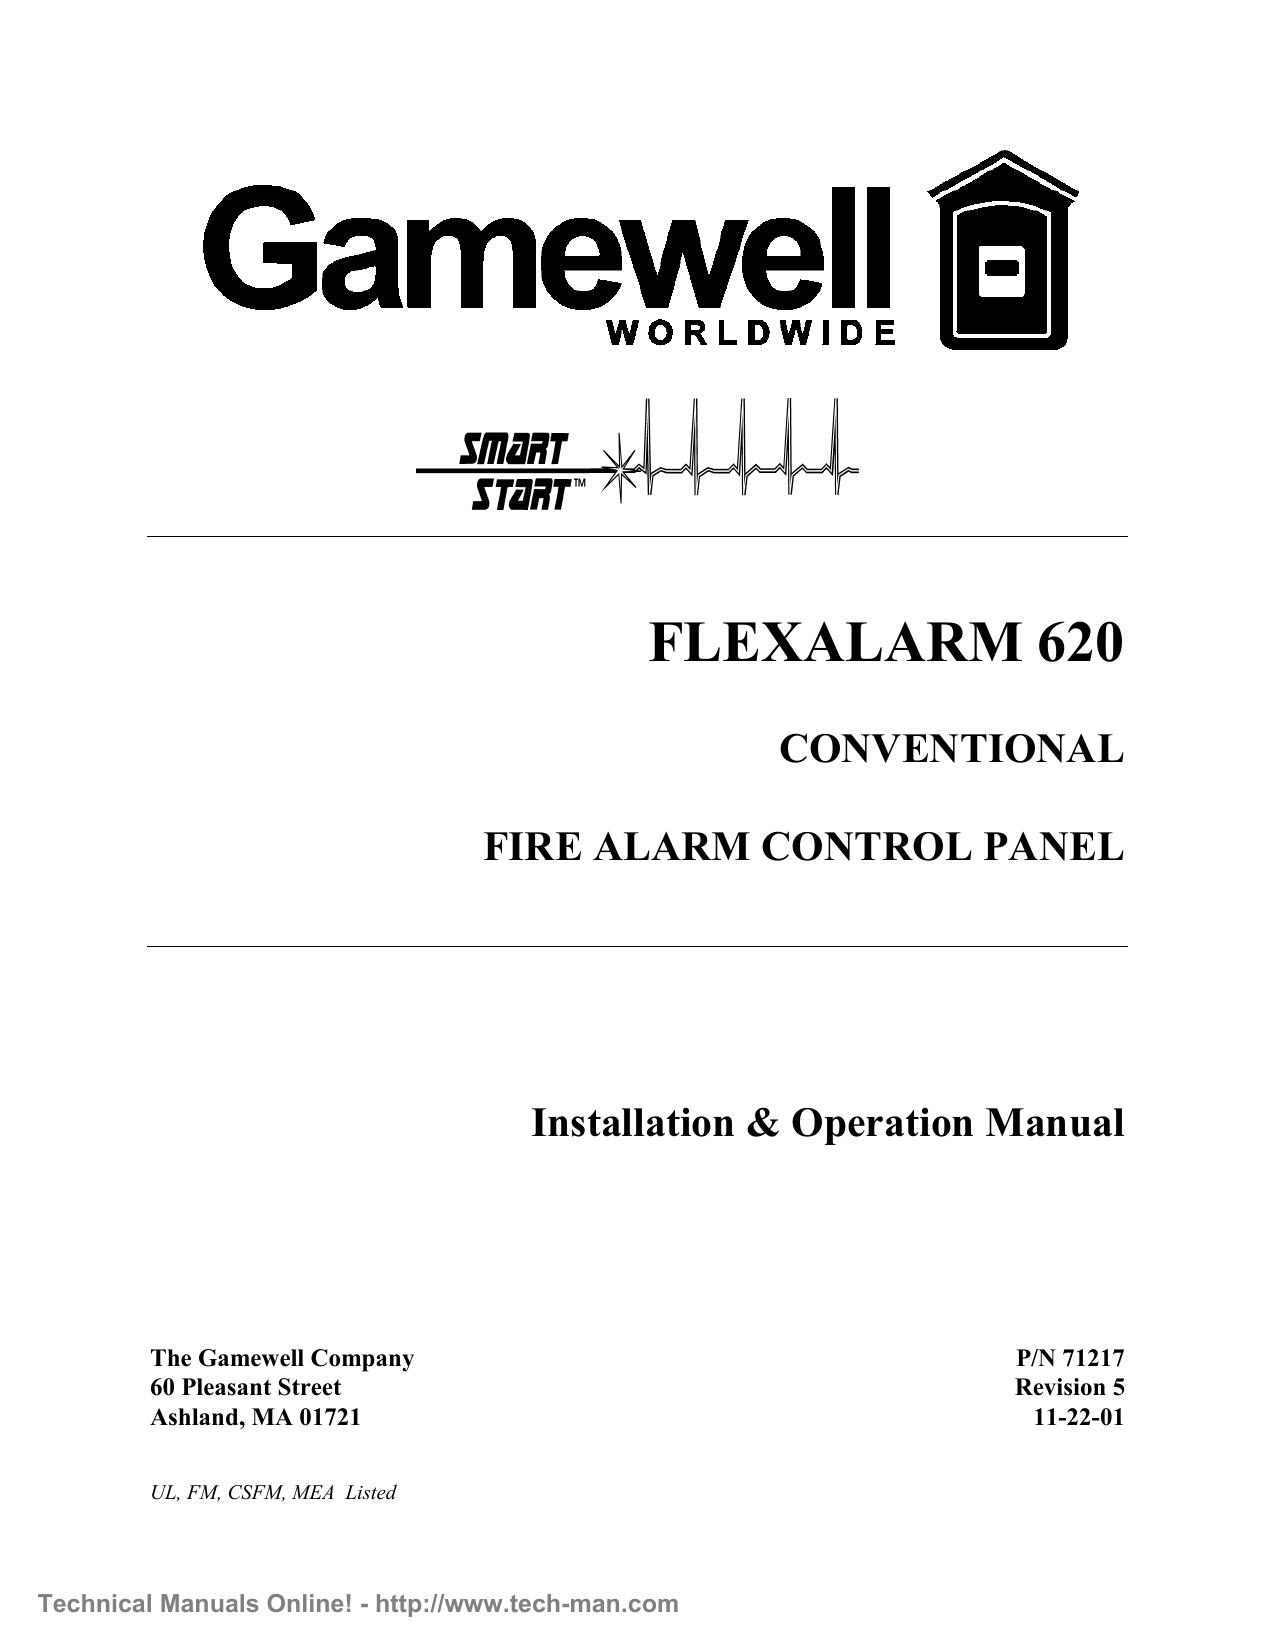 gamewell flexalarm 620 installation & user manual